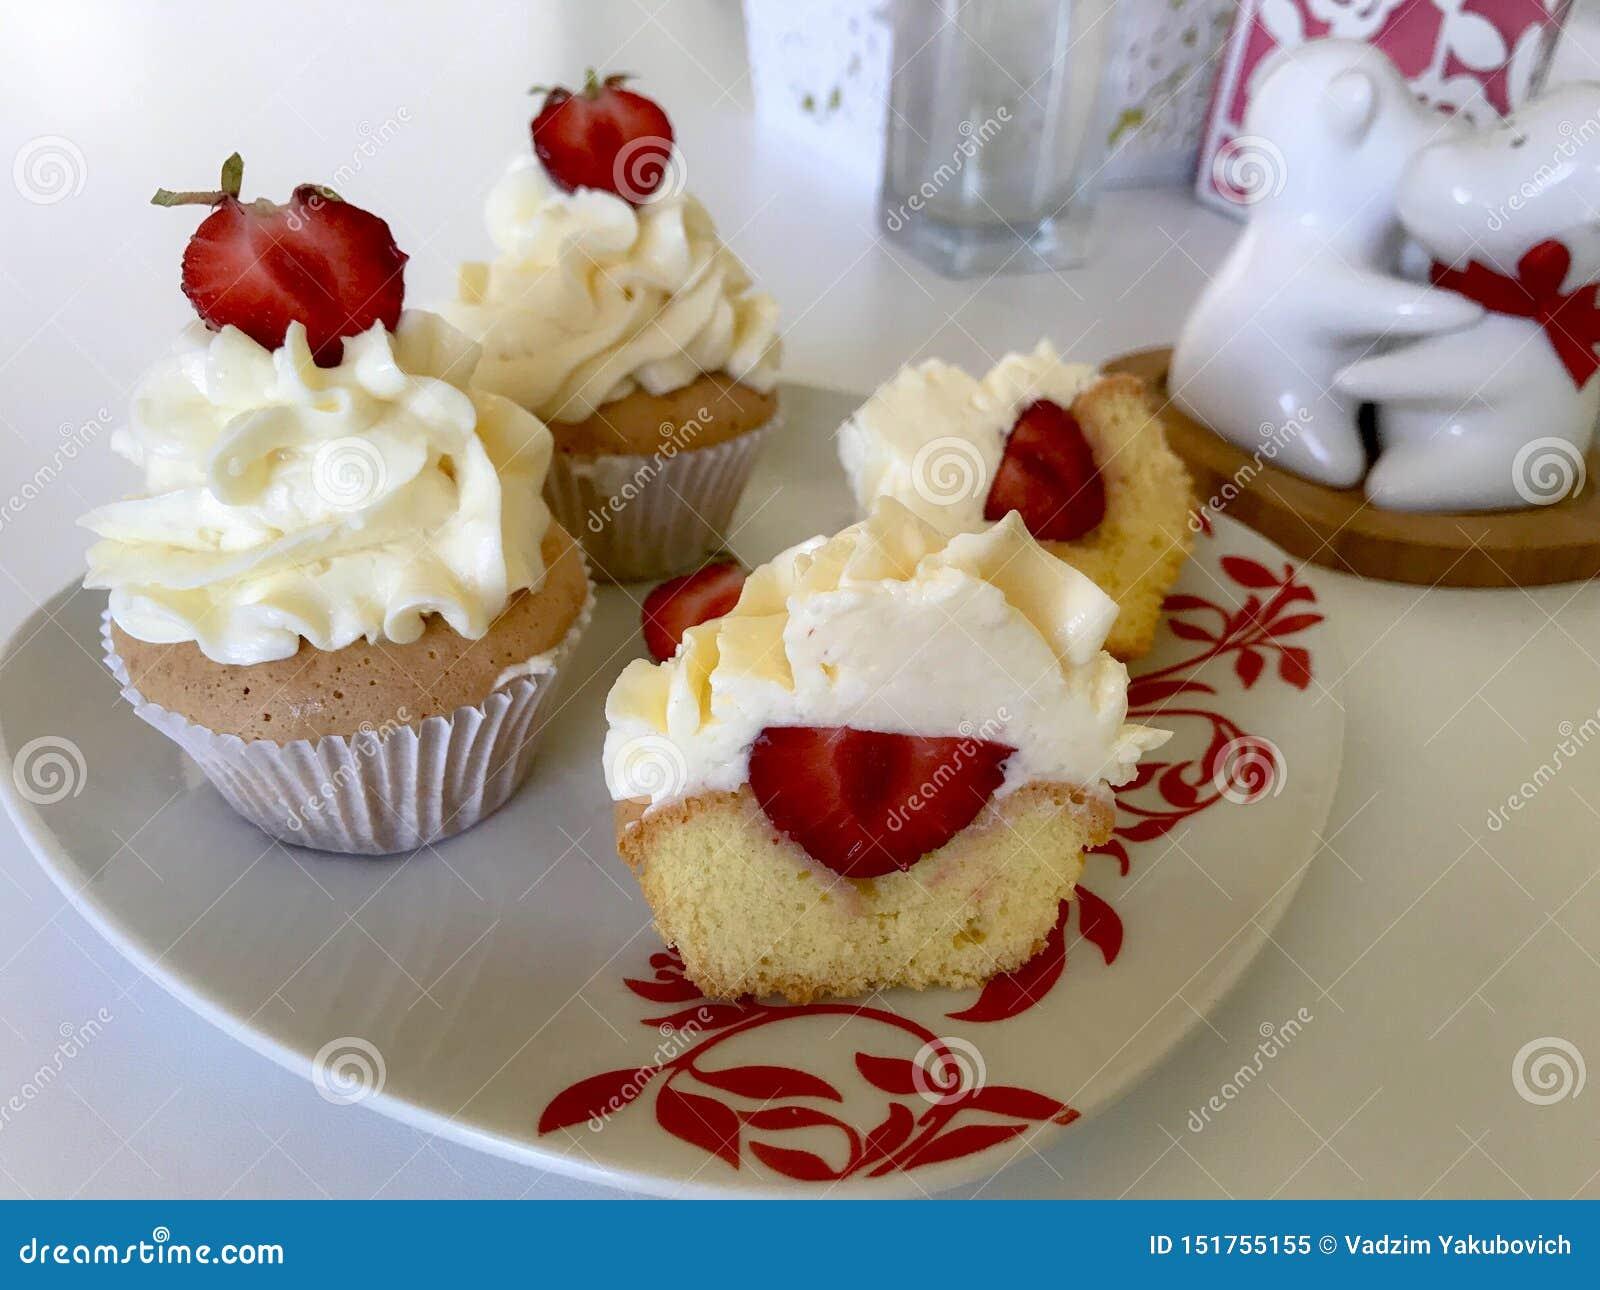 Cupcakes με τις φράουλες και τη βουτύρου κρέμα Ένας από τους κόβεται, η πλήρωση είναι ορατή Σε μια άσπρη επιφάνεια με διακοσμητικ